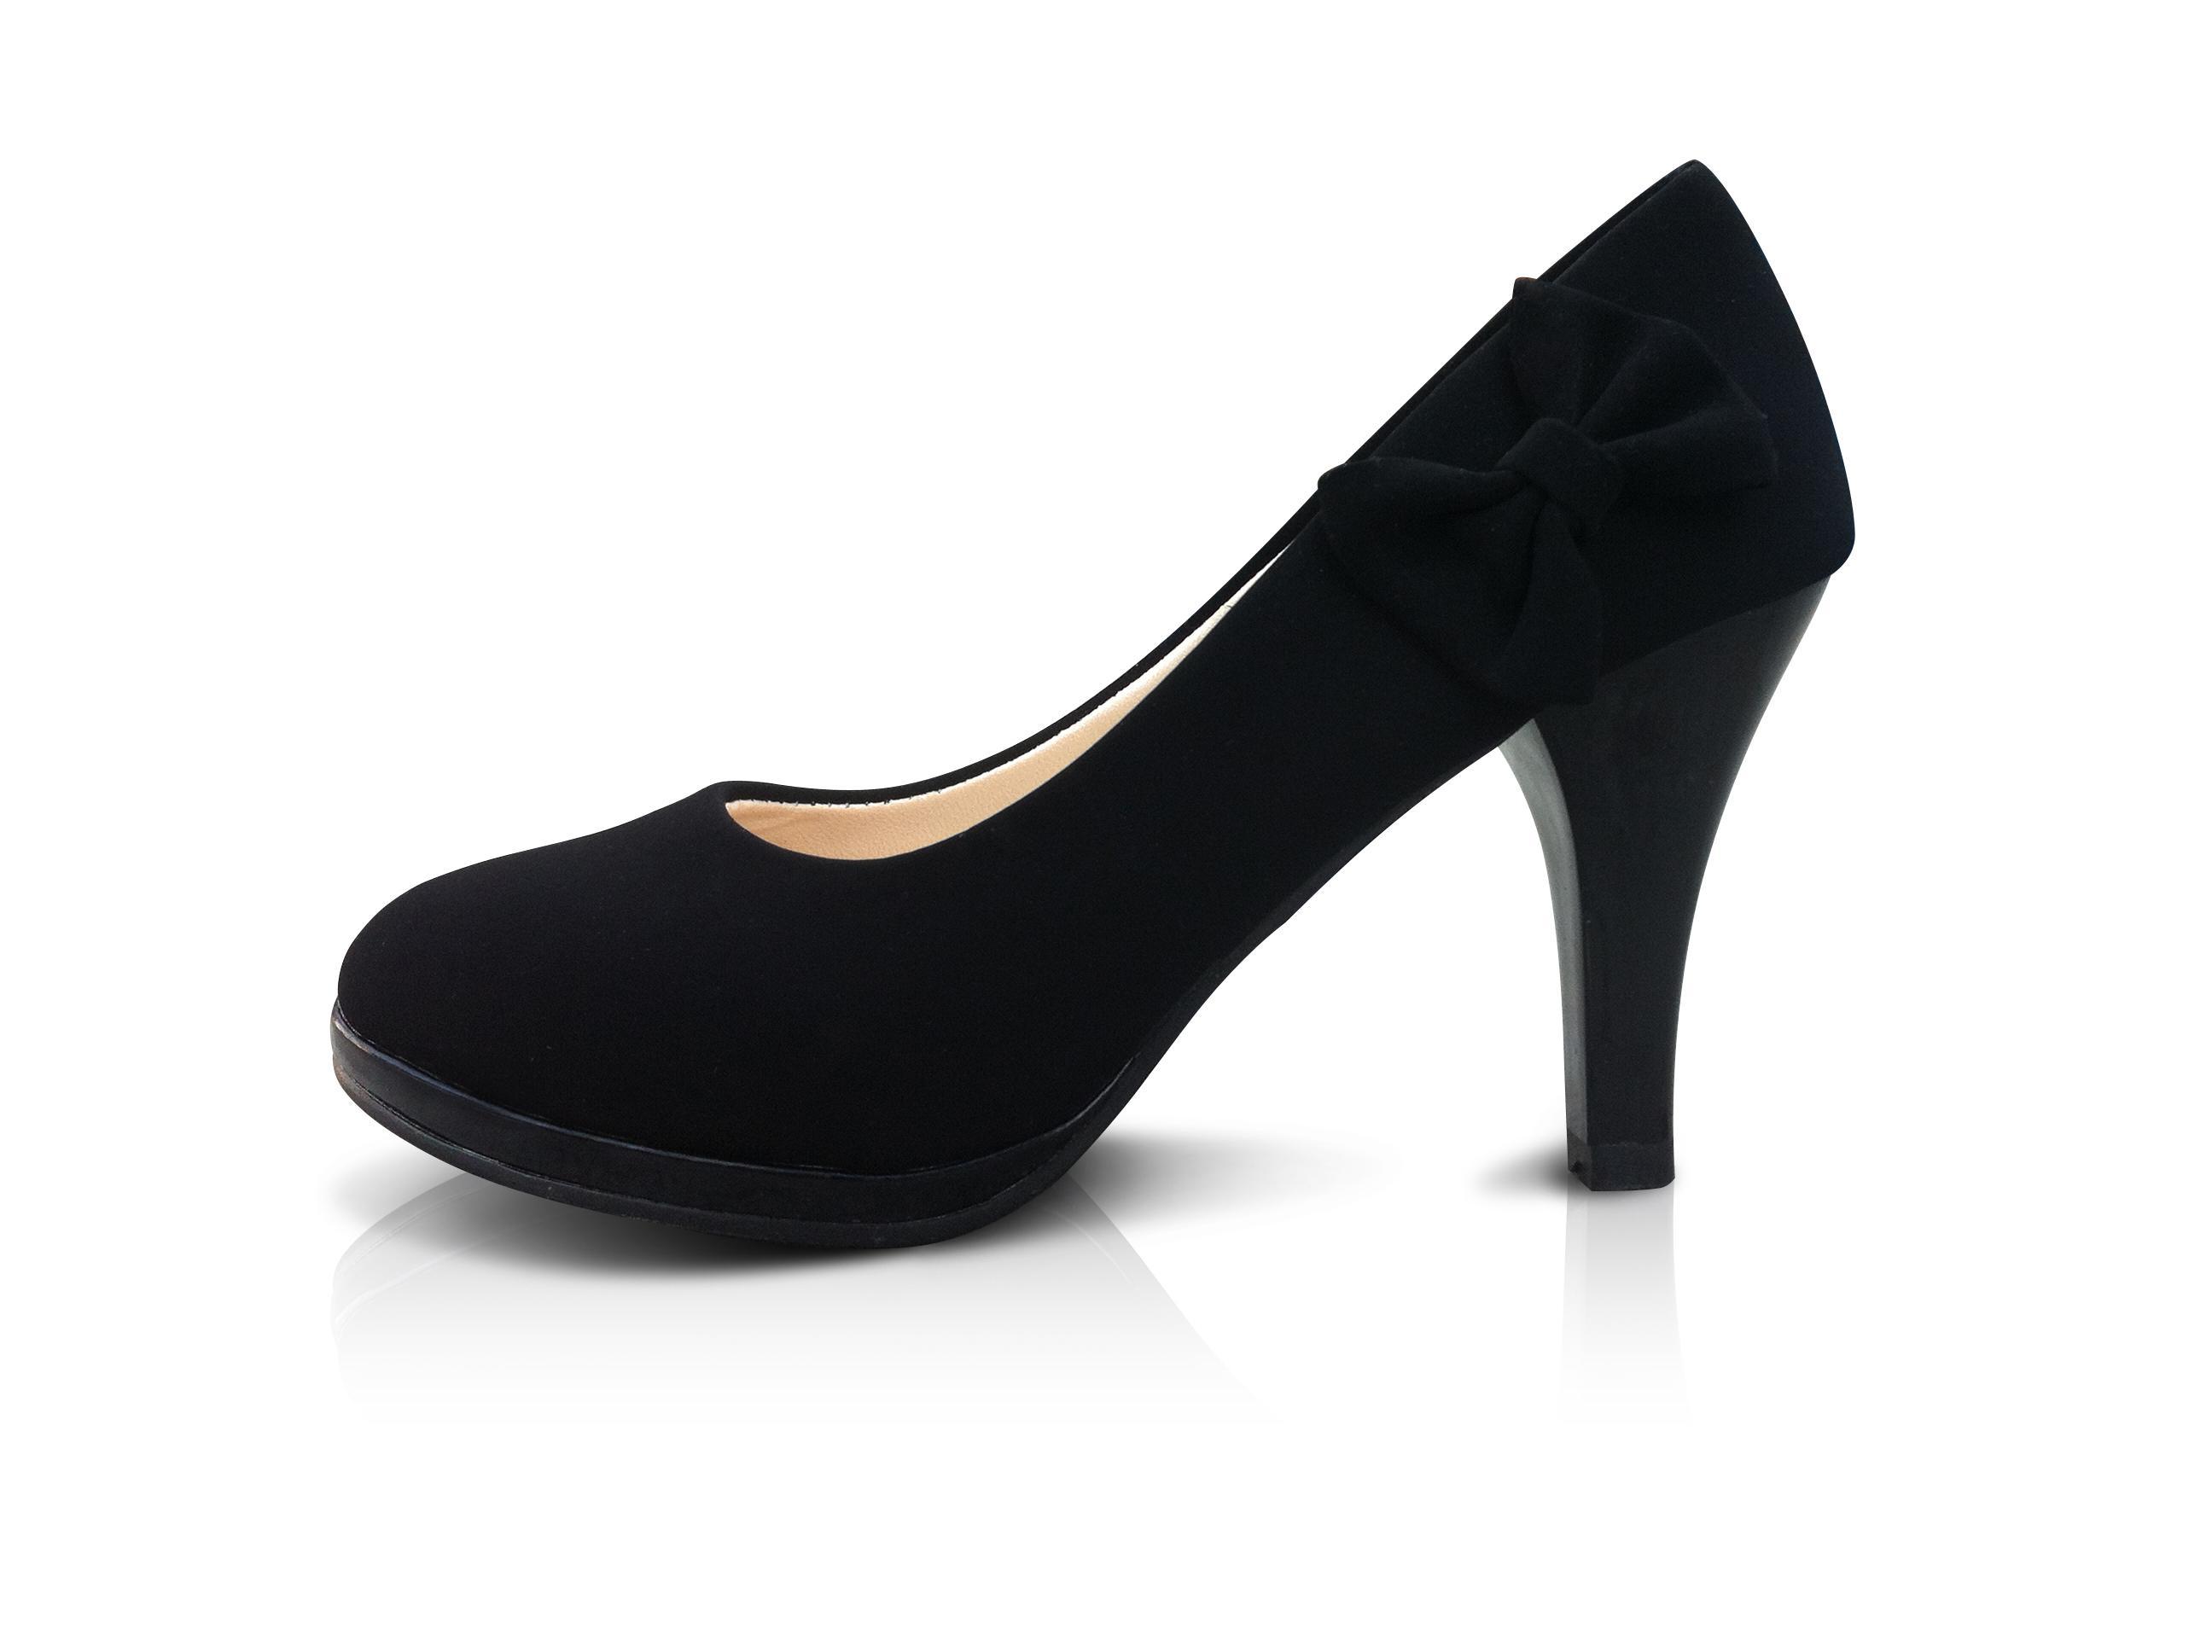 Best Platform Dress Shoes For Women to Buy | Buy New Platform ...